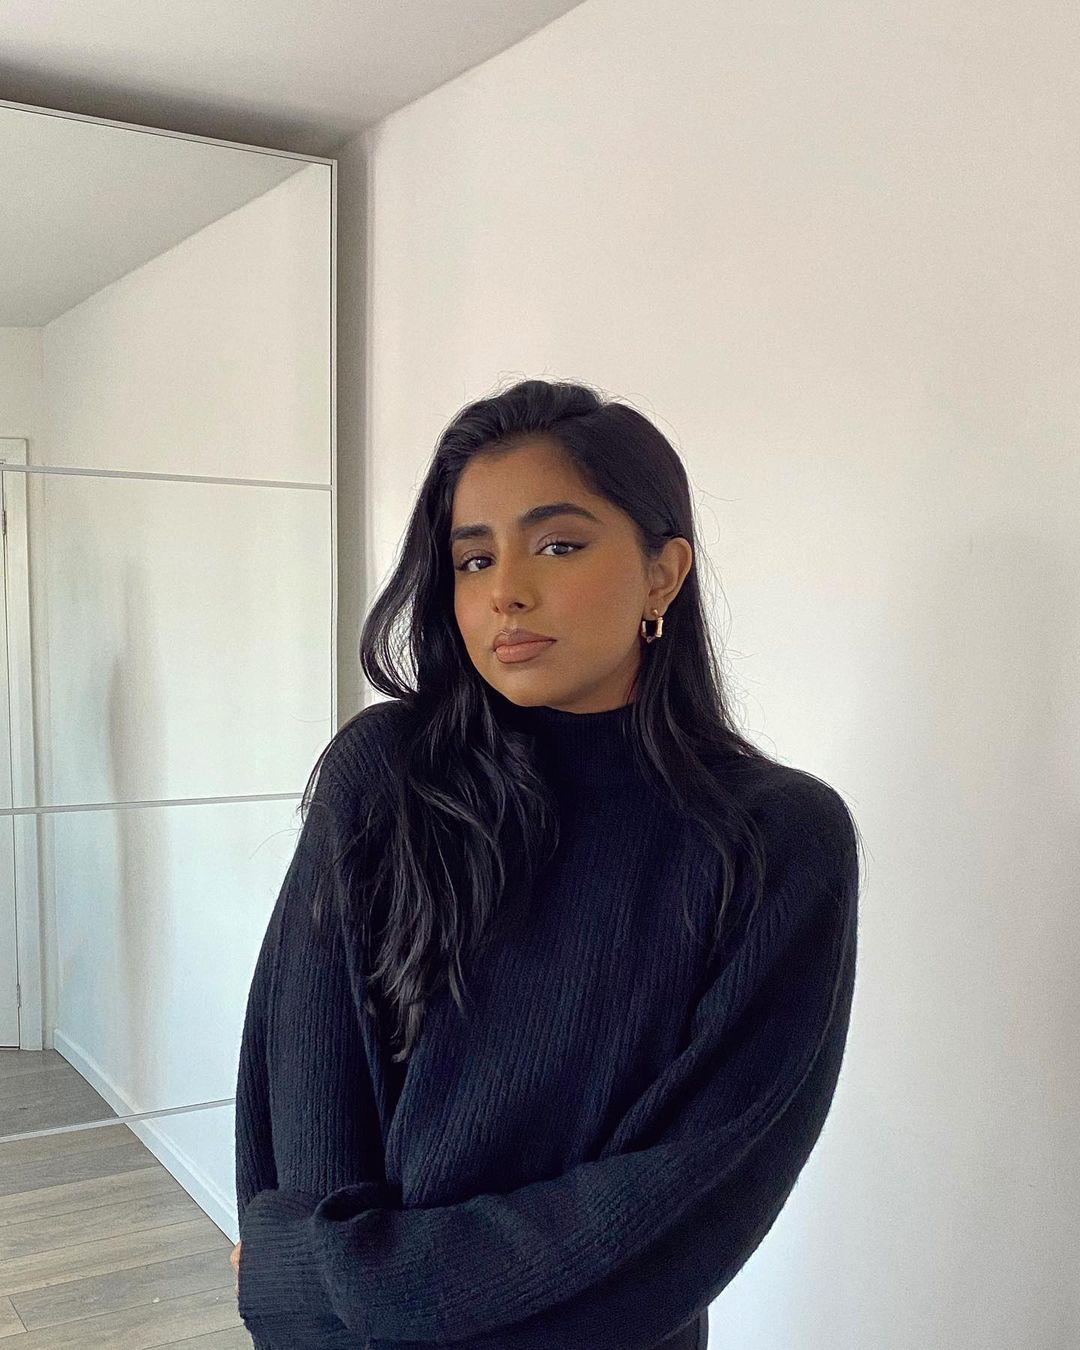 Soniaa-jay-Wallpapers-Insta-Fit-Bio-1